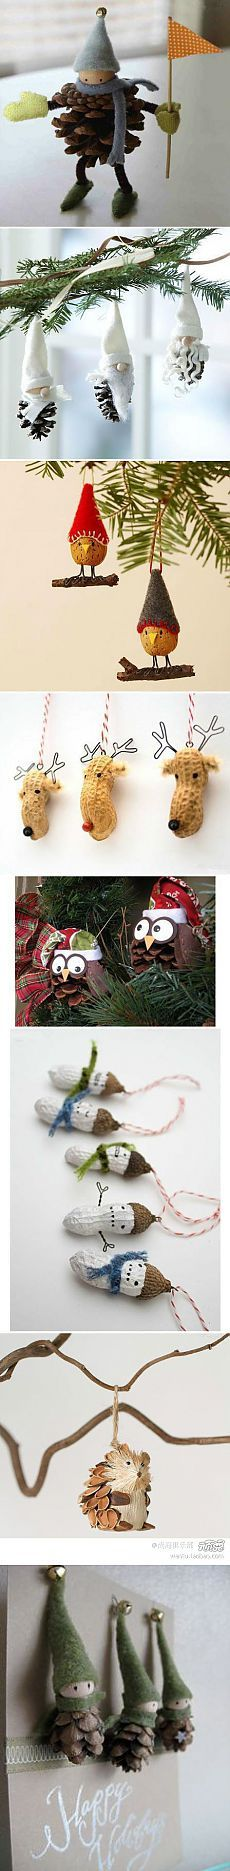 Pin by susan buckham on christmas craft